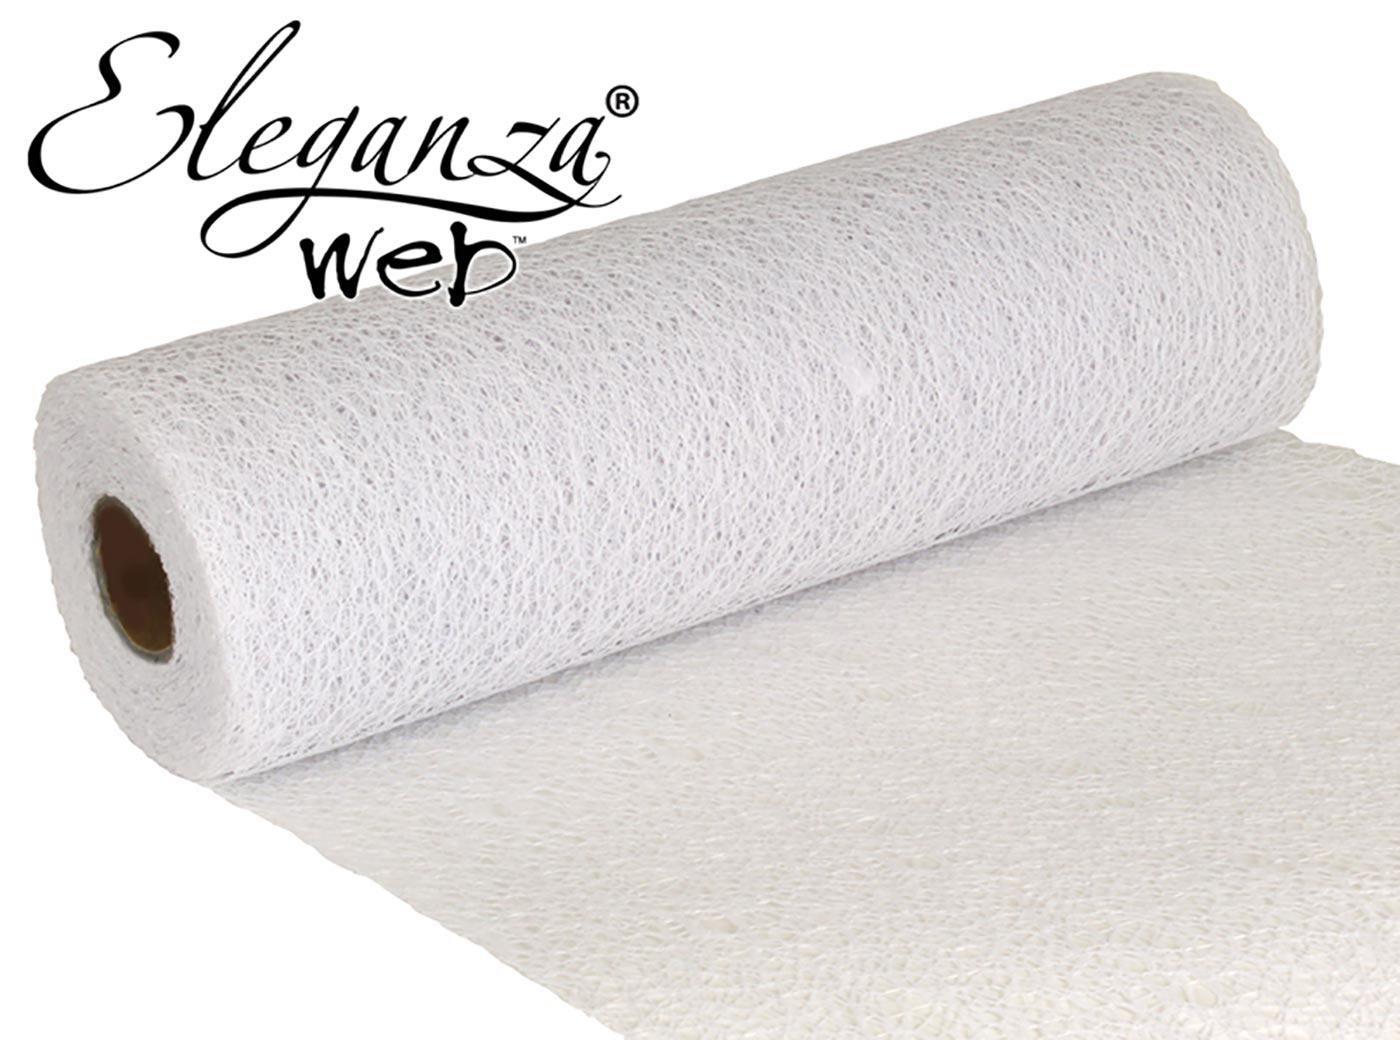 Eleganza Web Fabric roll 28cm x 10m White